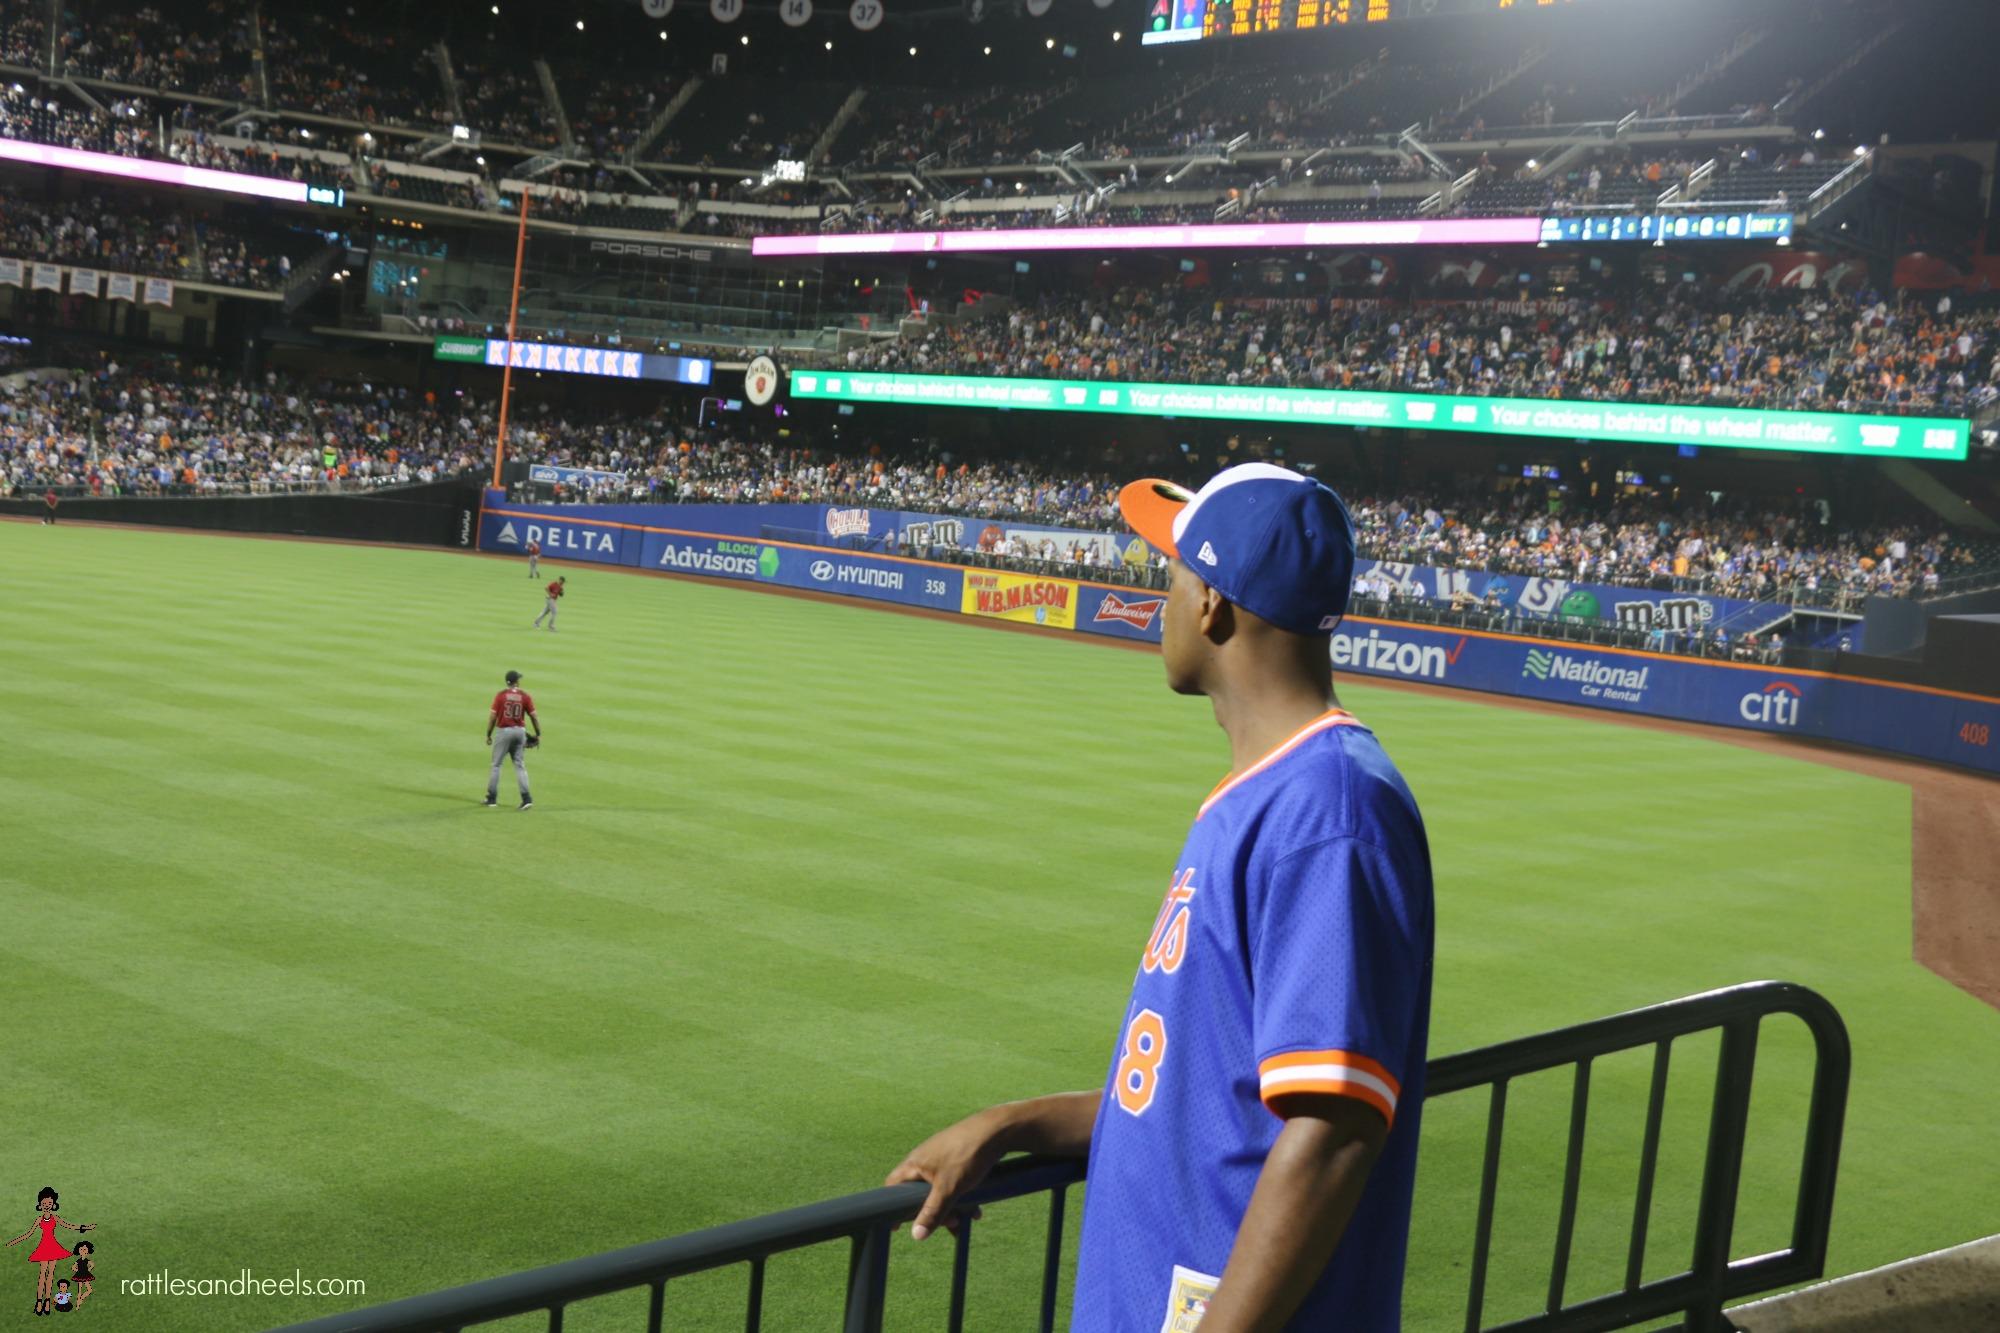 New York Mets Baseball Games Recap